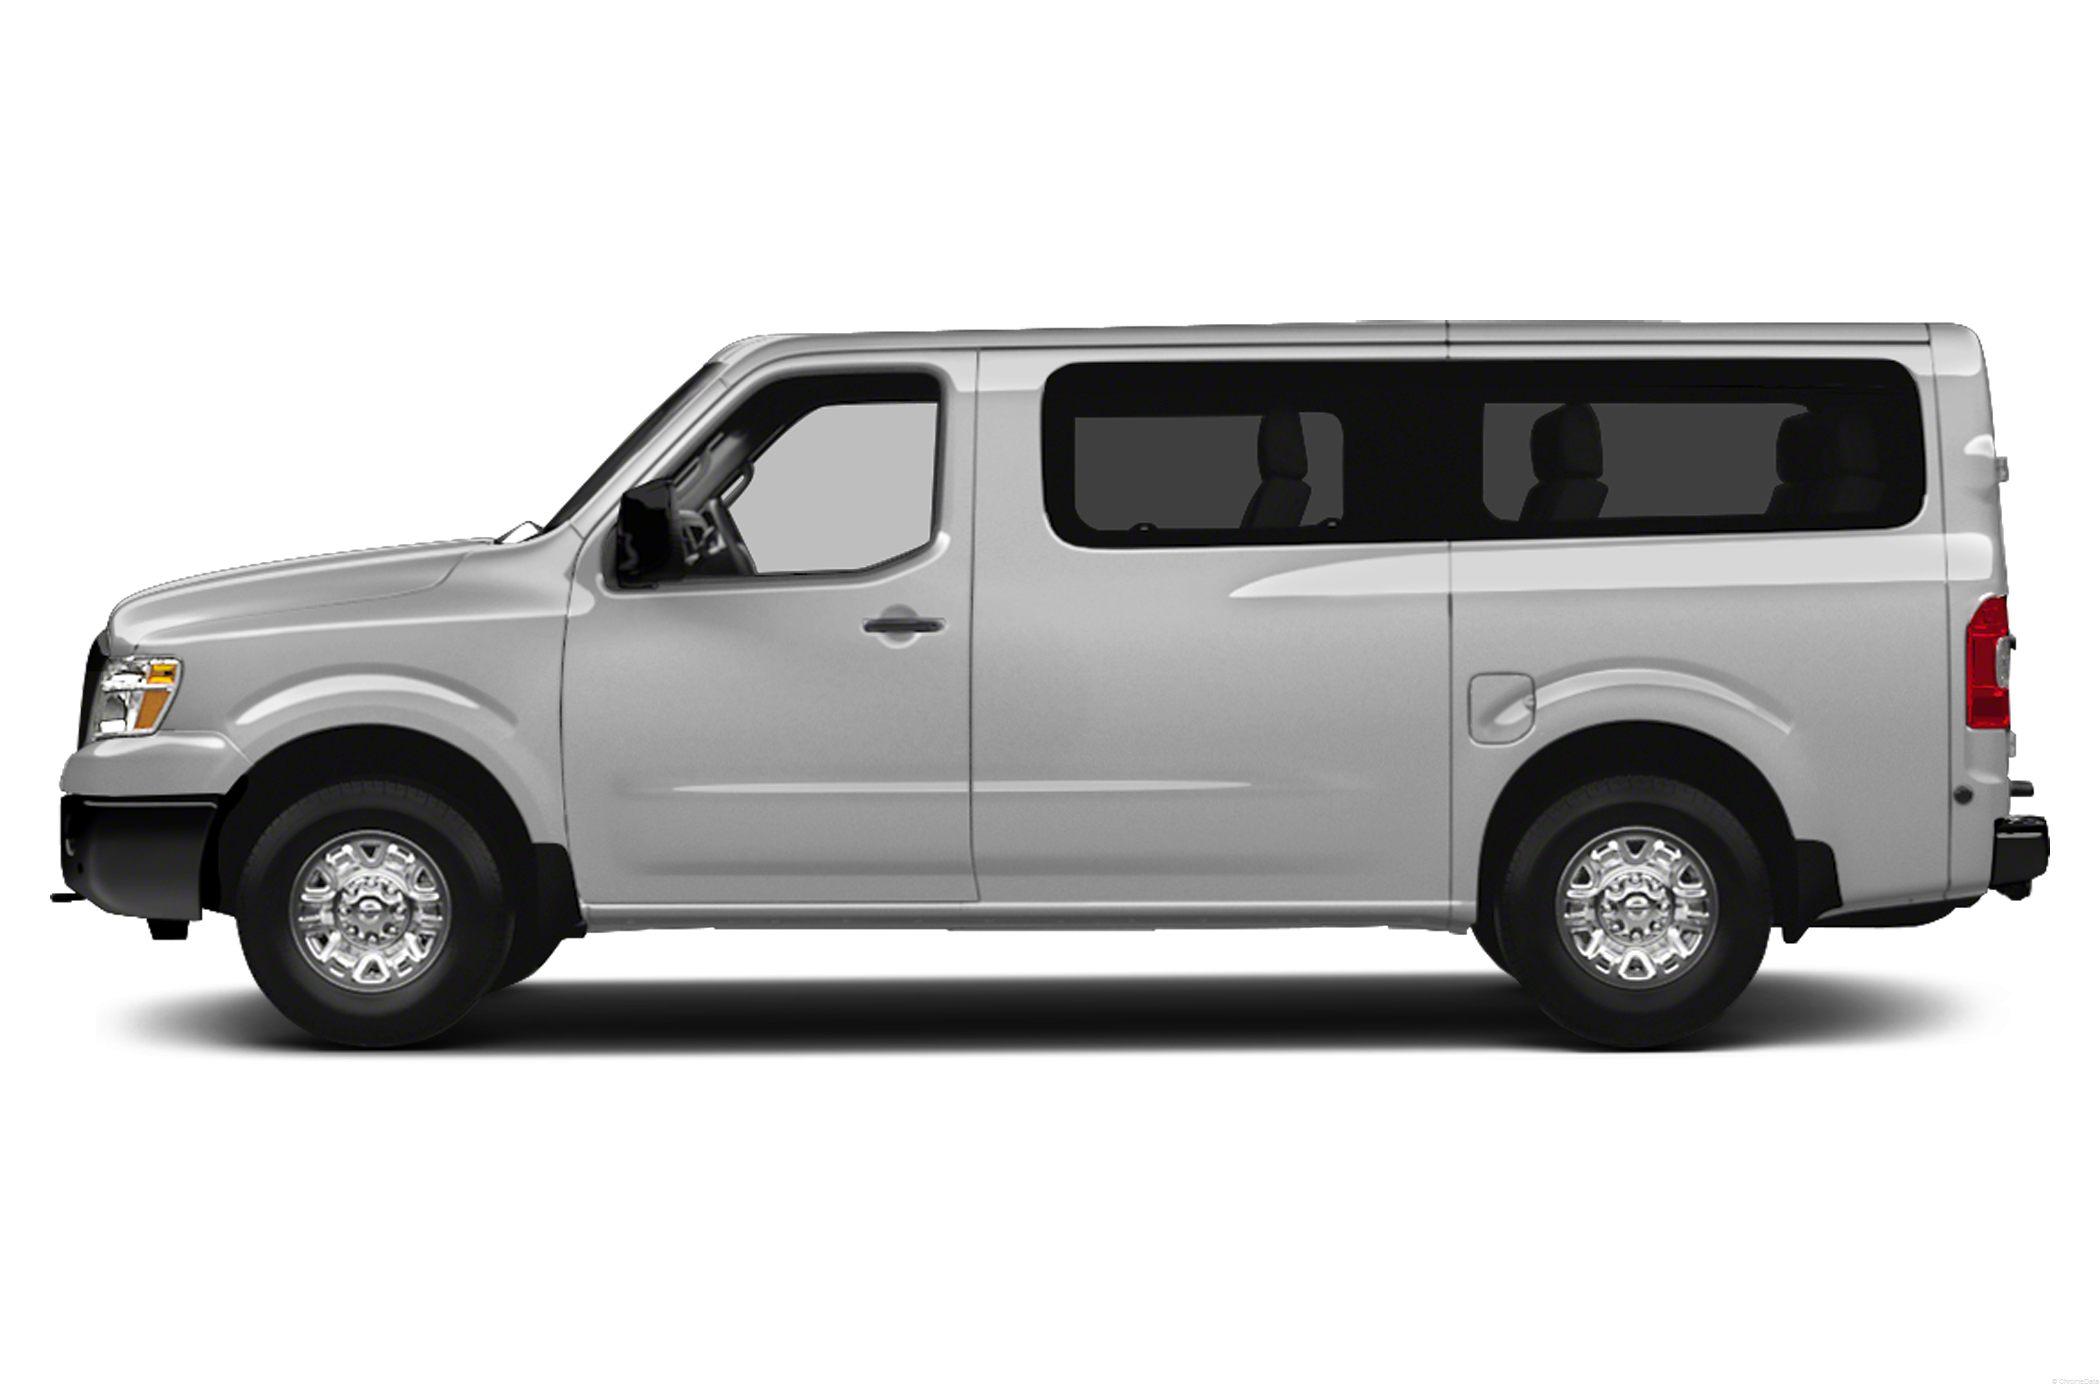 Nissan Nv Passenger Van >> 2013 NISSAN NV - Image #17